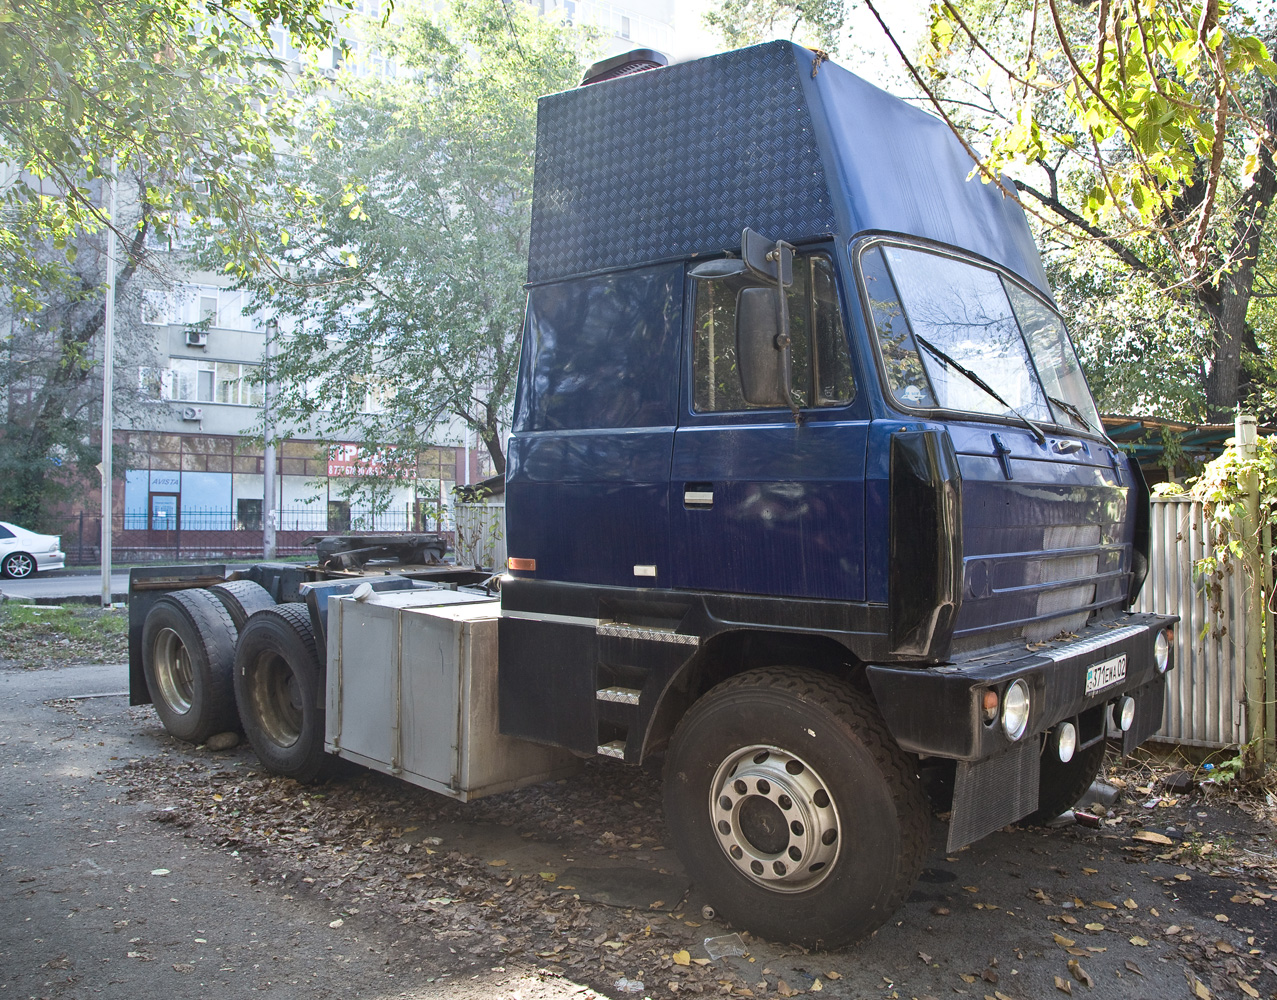 Тягач Tatra T815 #371 EWA 02. Алматы, улица Толе би